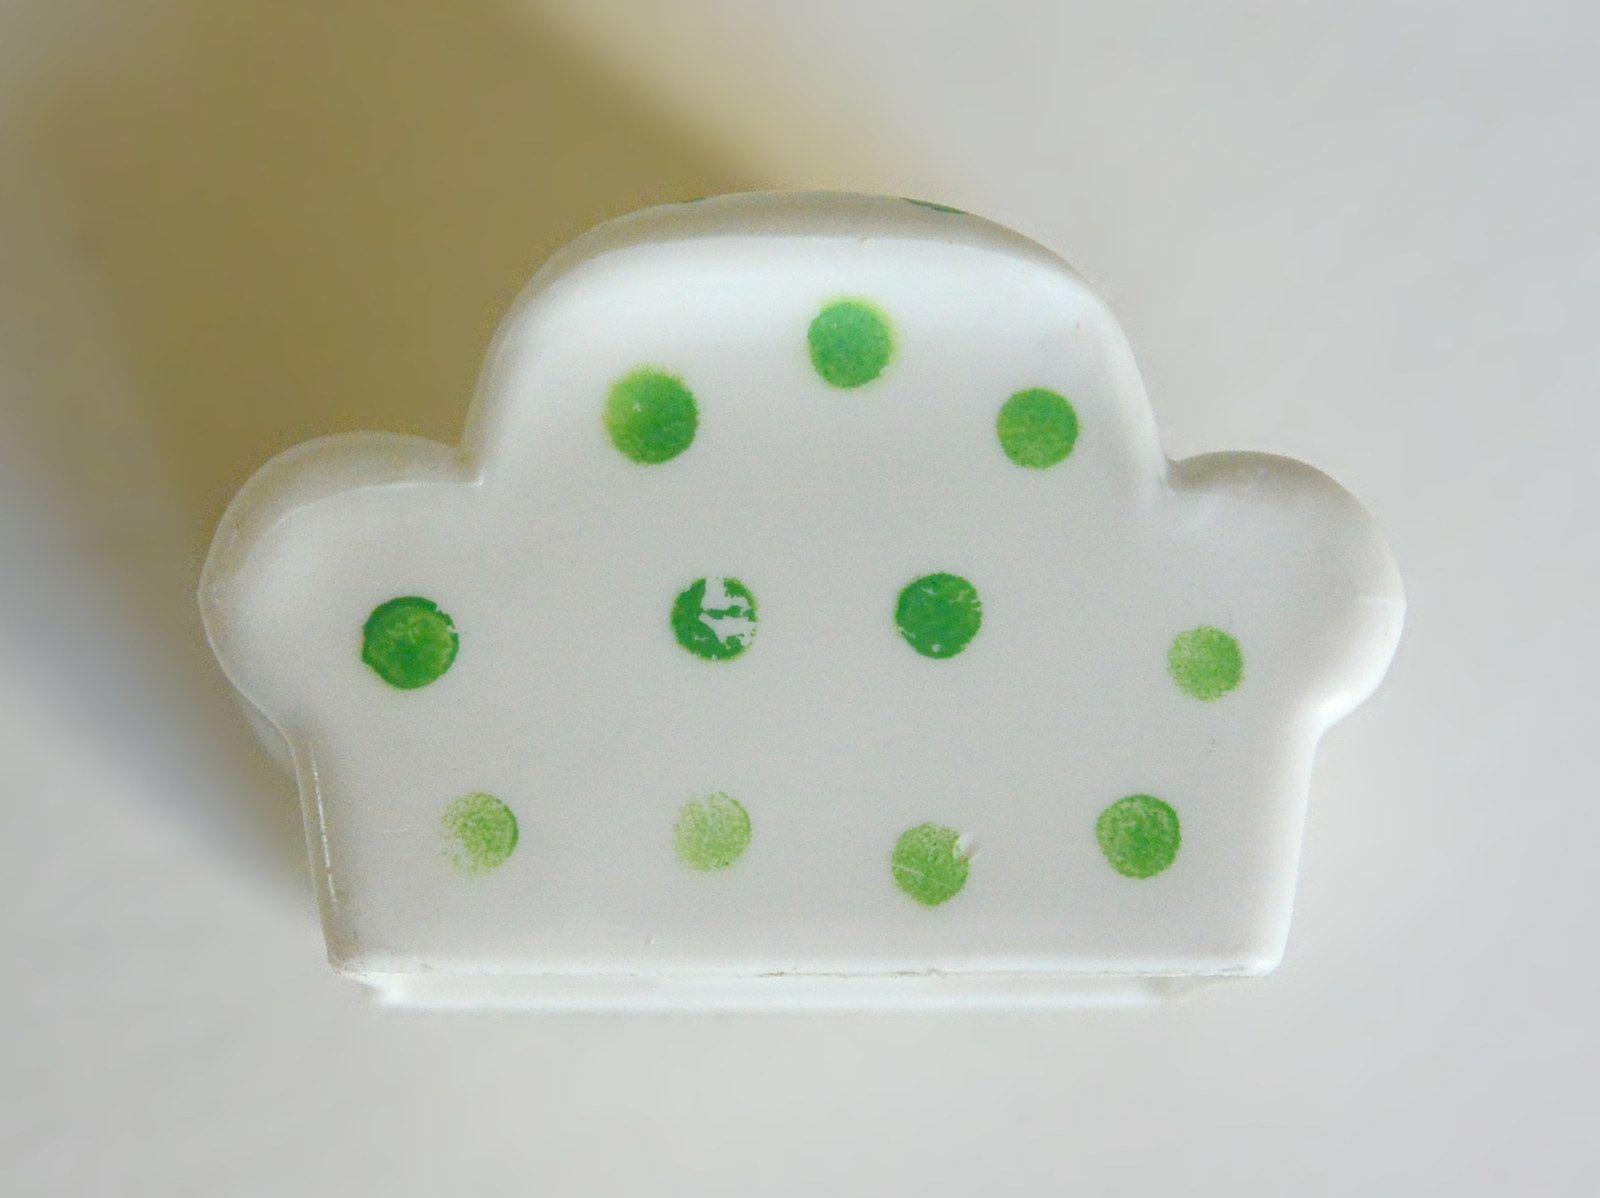 Fauteuil blanc à pois verts Little People Fisher Price© vintage